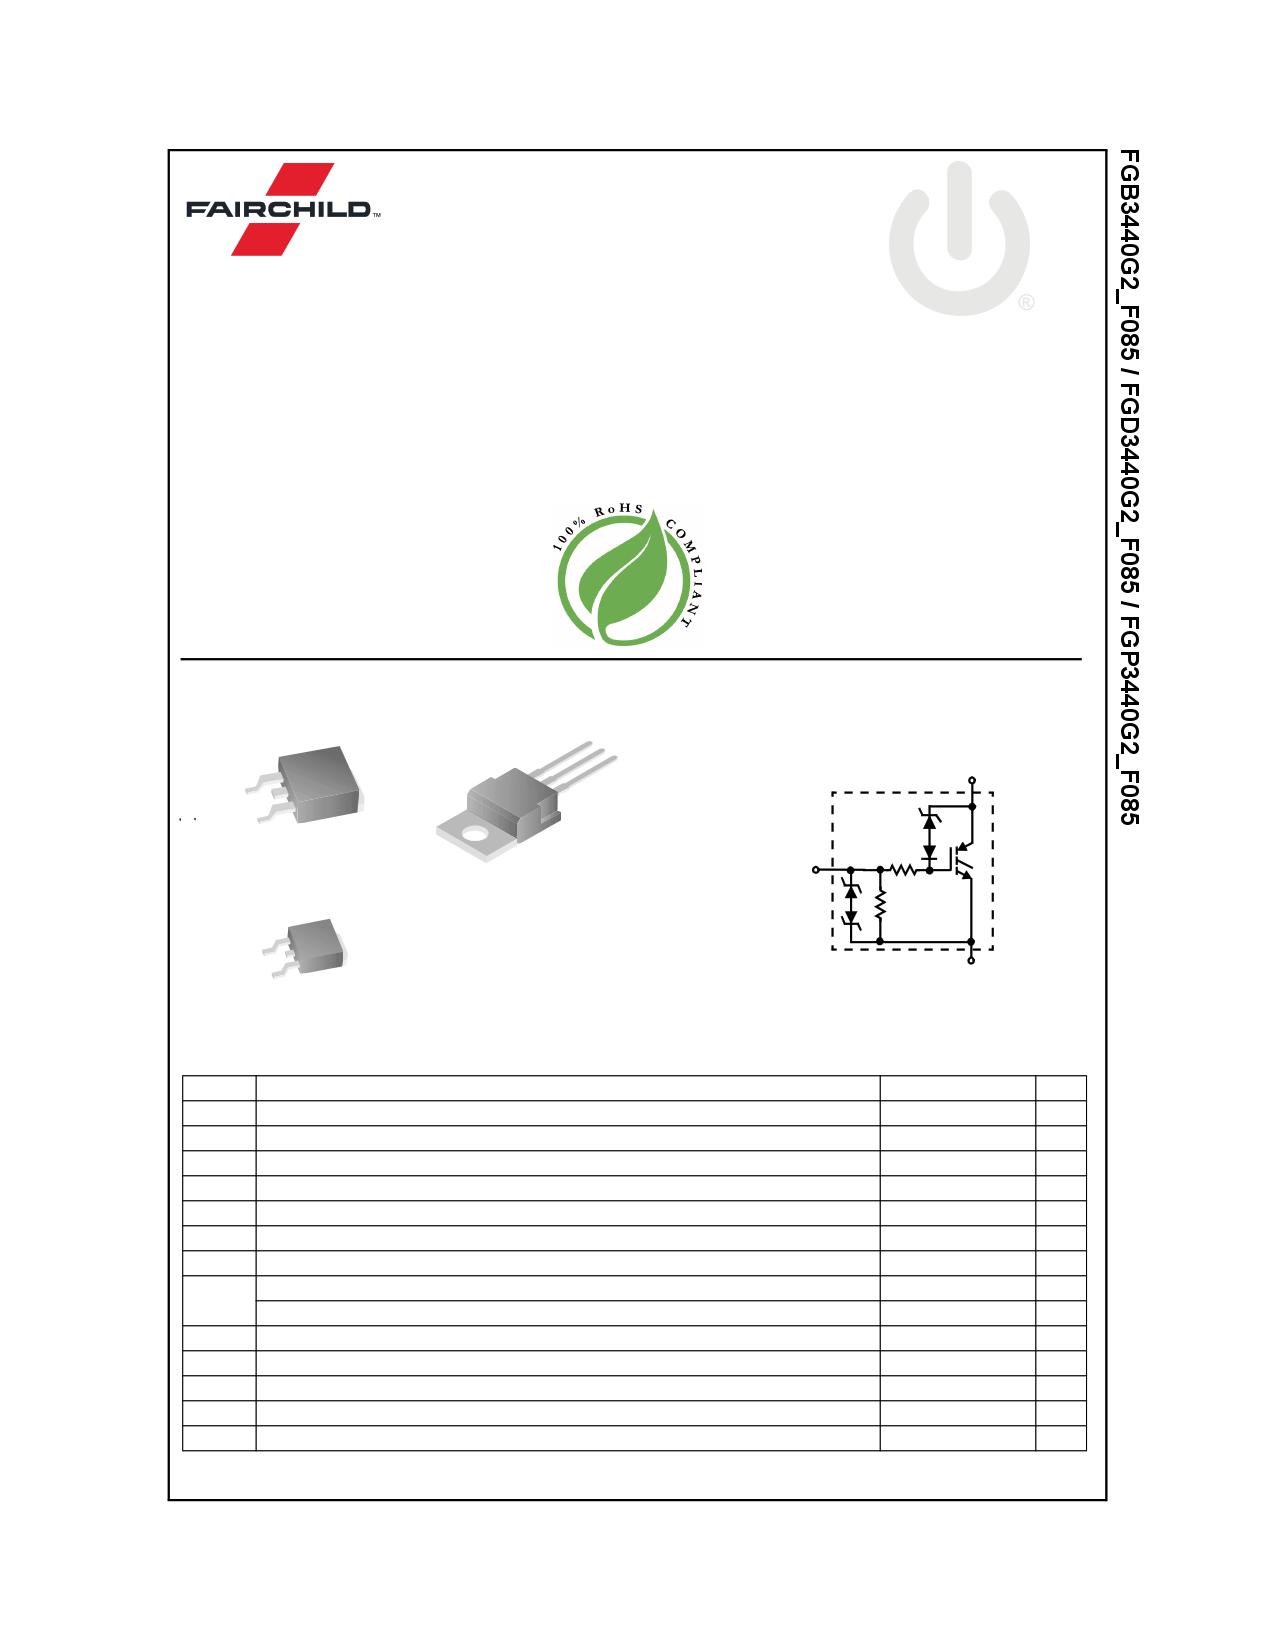 FGD3440G2_F085 데이터시트 및 FGD3440G2_F085 PDF